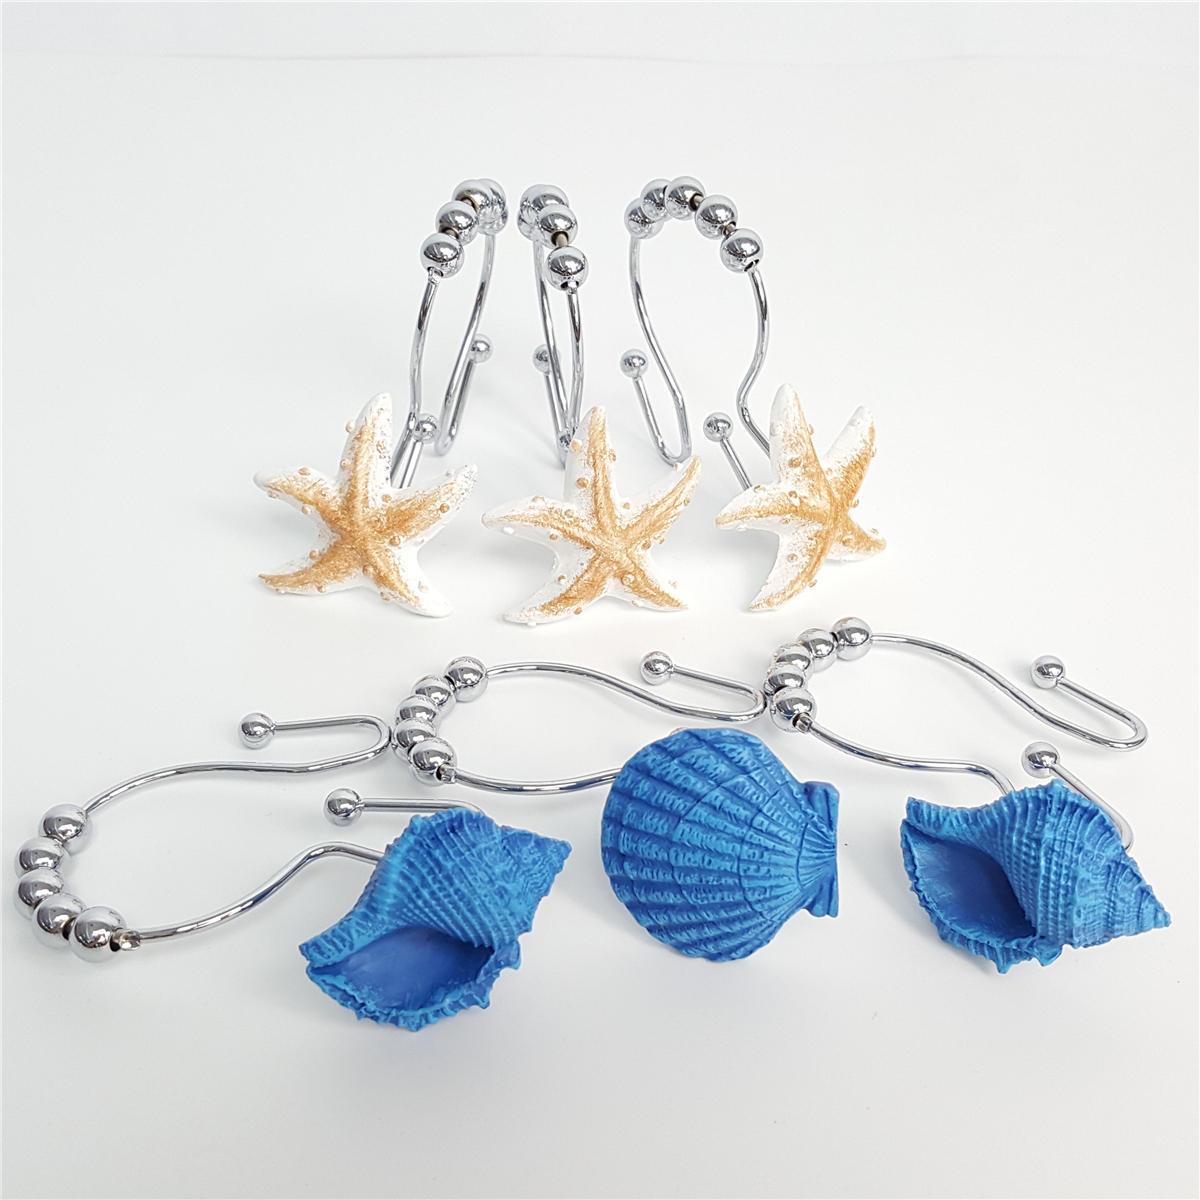 12pcs Resin Decorative Seashell Home Shower Curtain Hooks Bathroom Beach Shell Decor